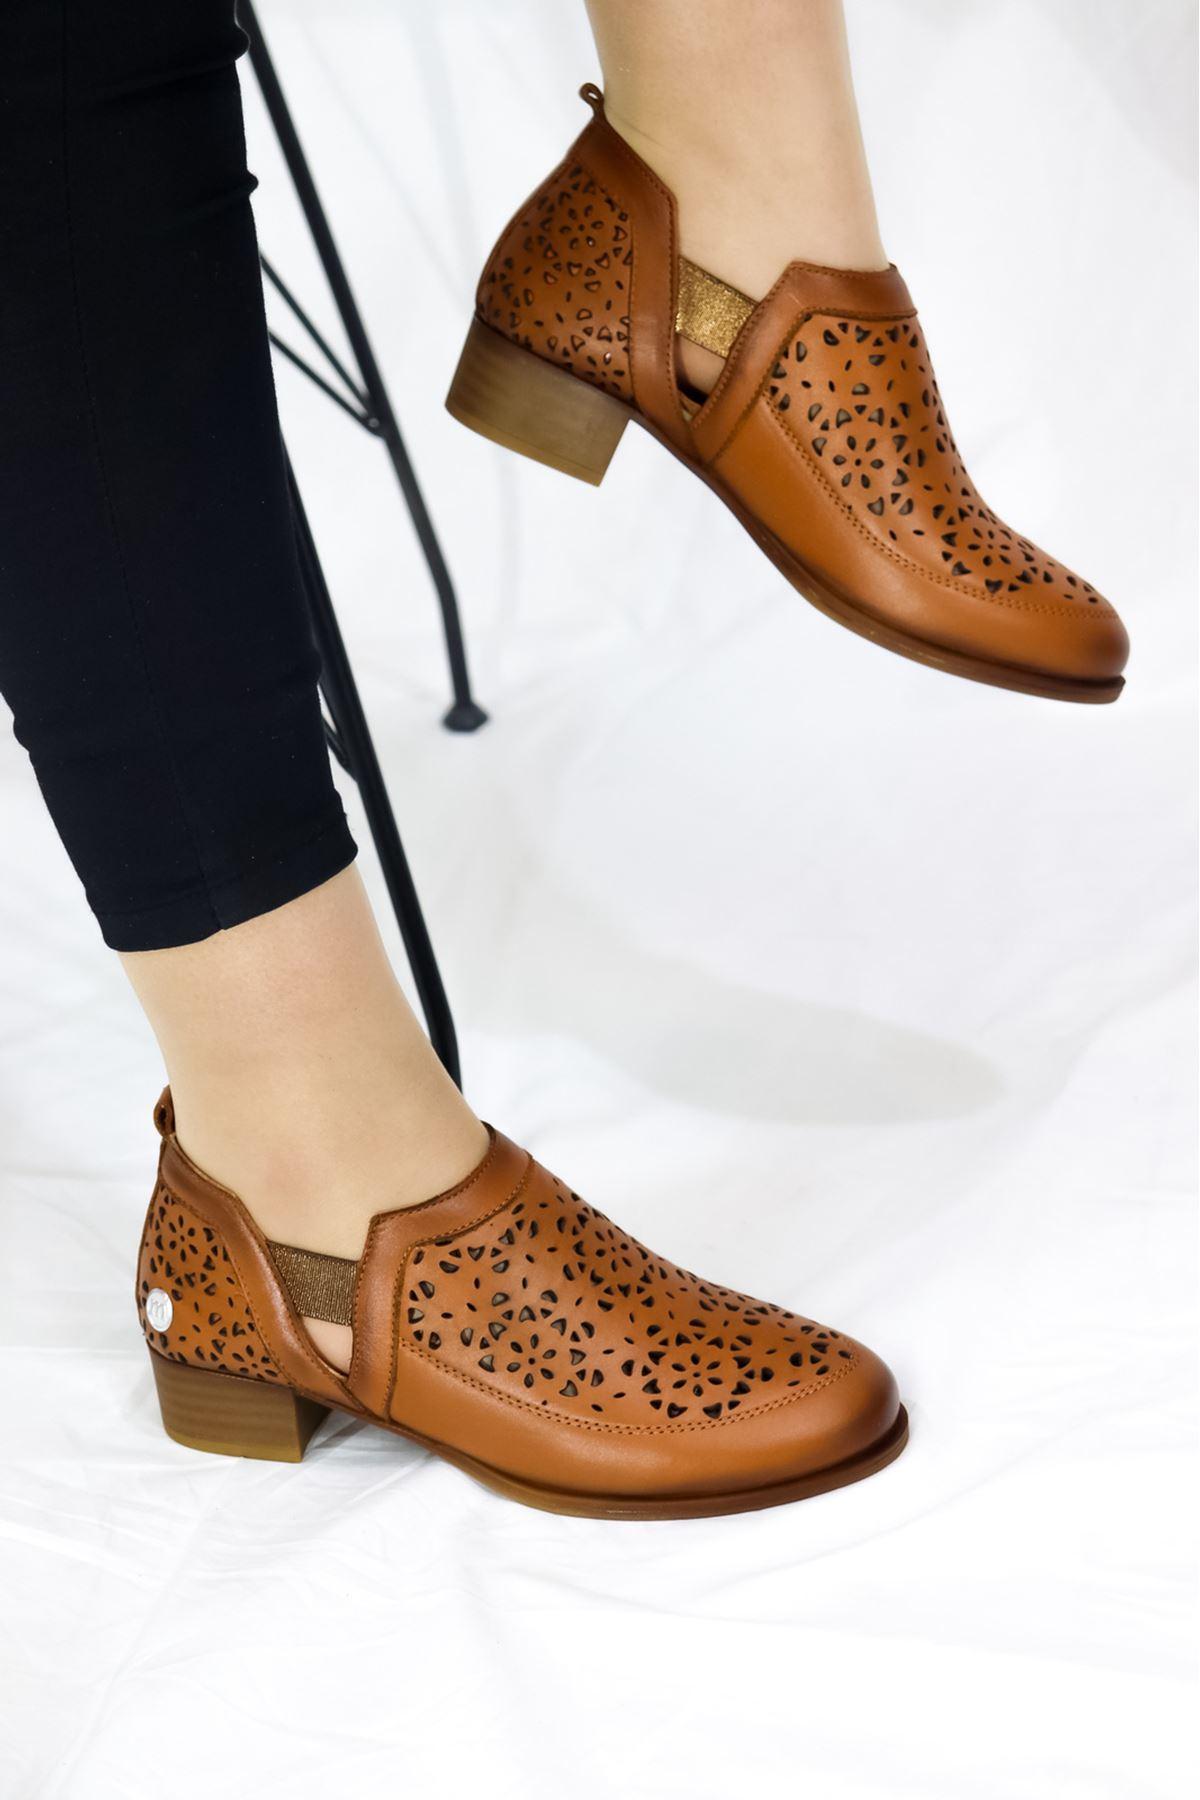 Mammamia - D21YA - 455-B Taba Kadın Ayakkabısı